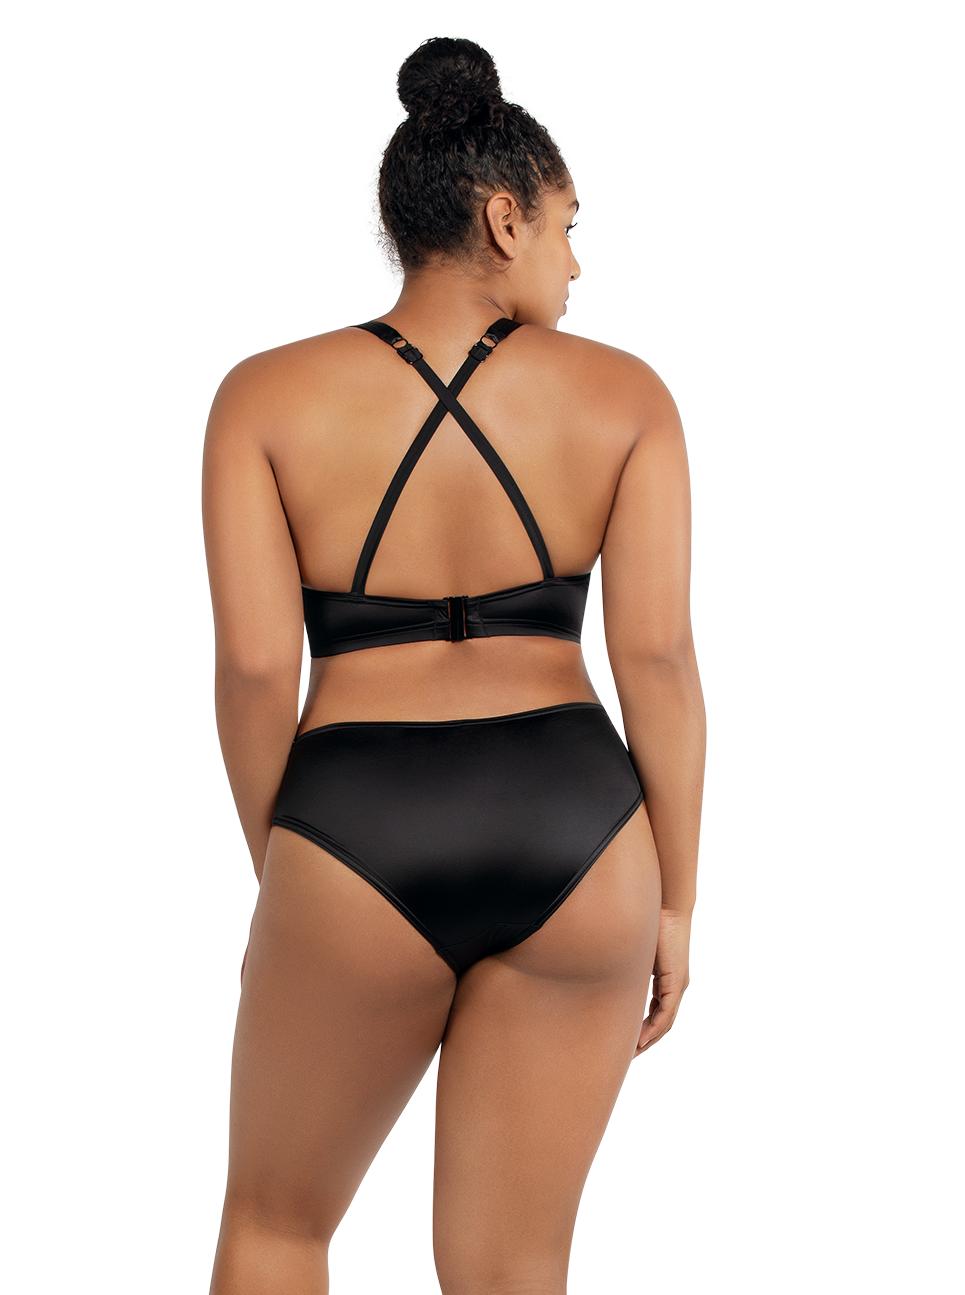 PARFAIT Rita LonglinePlungeTopS8142 BikiniBottomS8143 Black Back - Rita Longline Plunge Top Black S8142